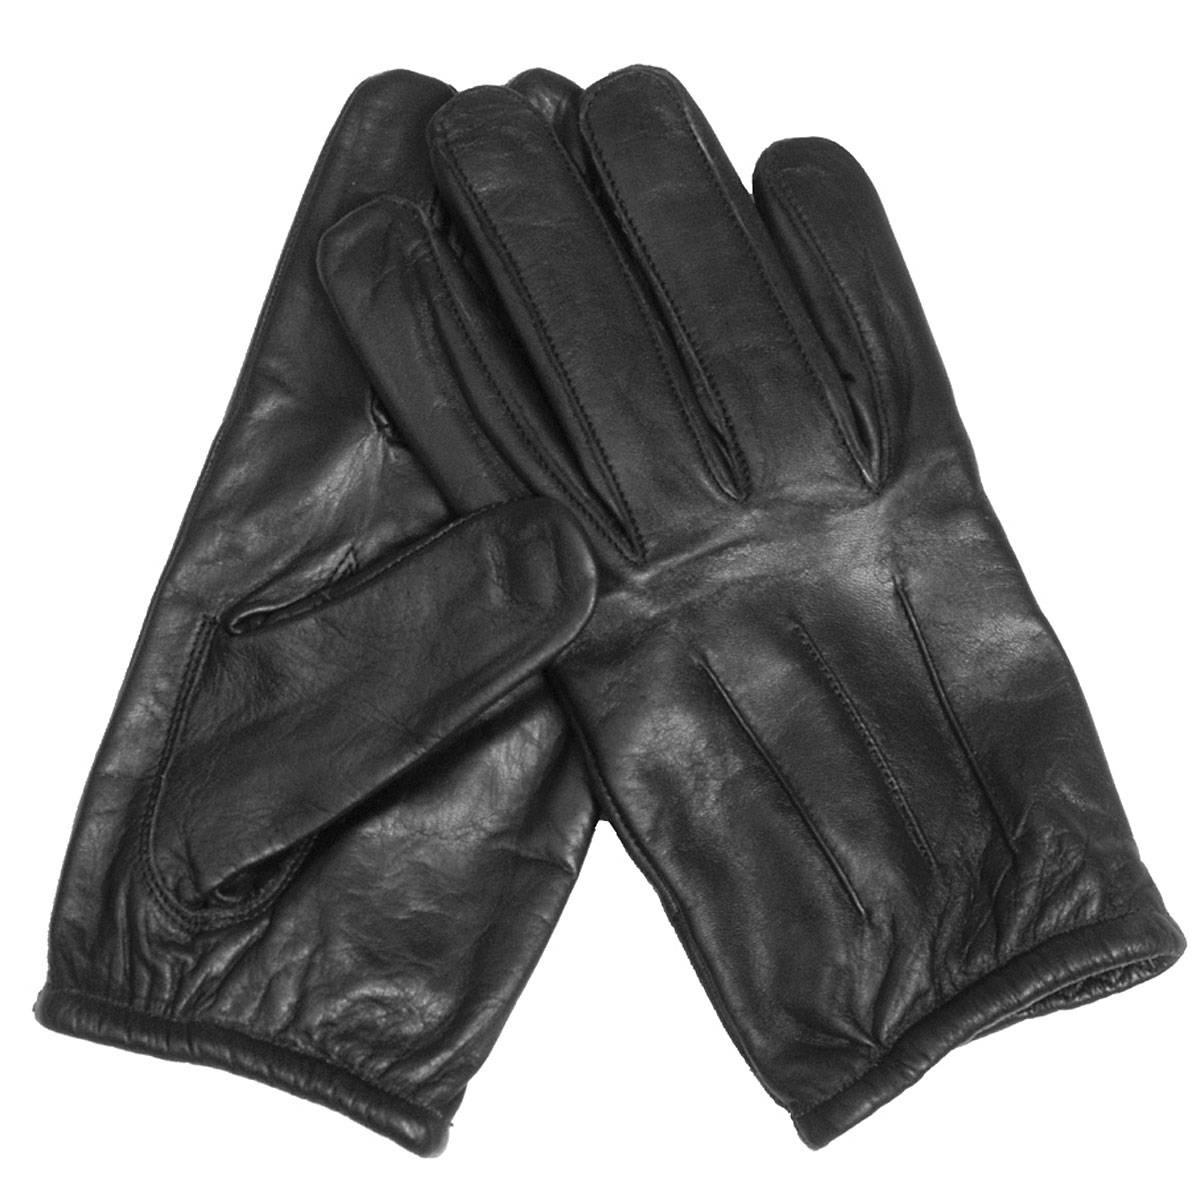 aramid handschuhe schnitthemmend xxl der gro e bundeswehr shop arm 21 90. Black Bedroom Furniture Sets. Home Design Ideas